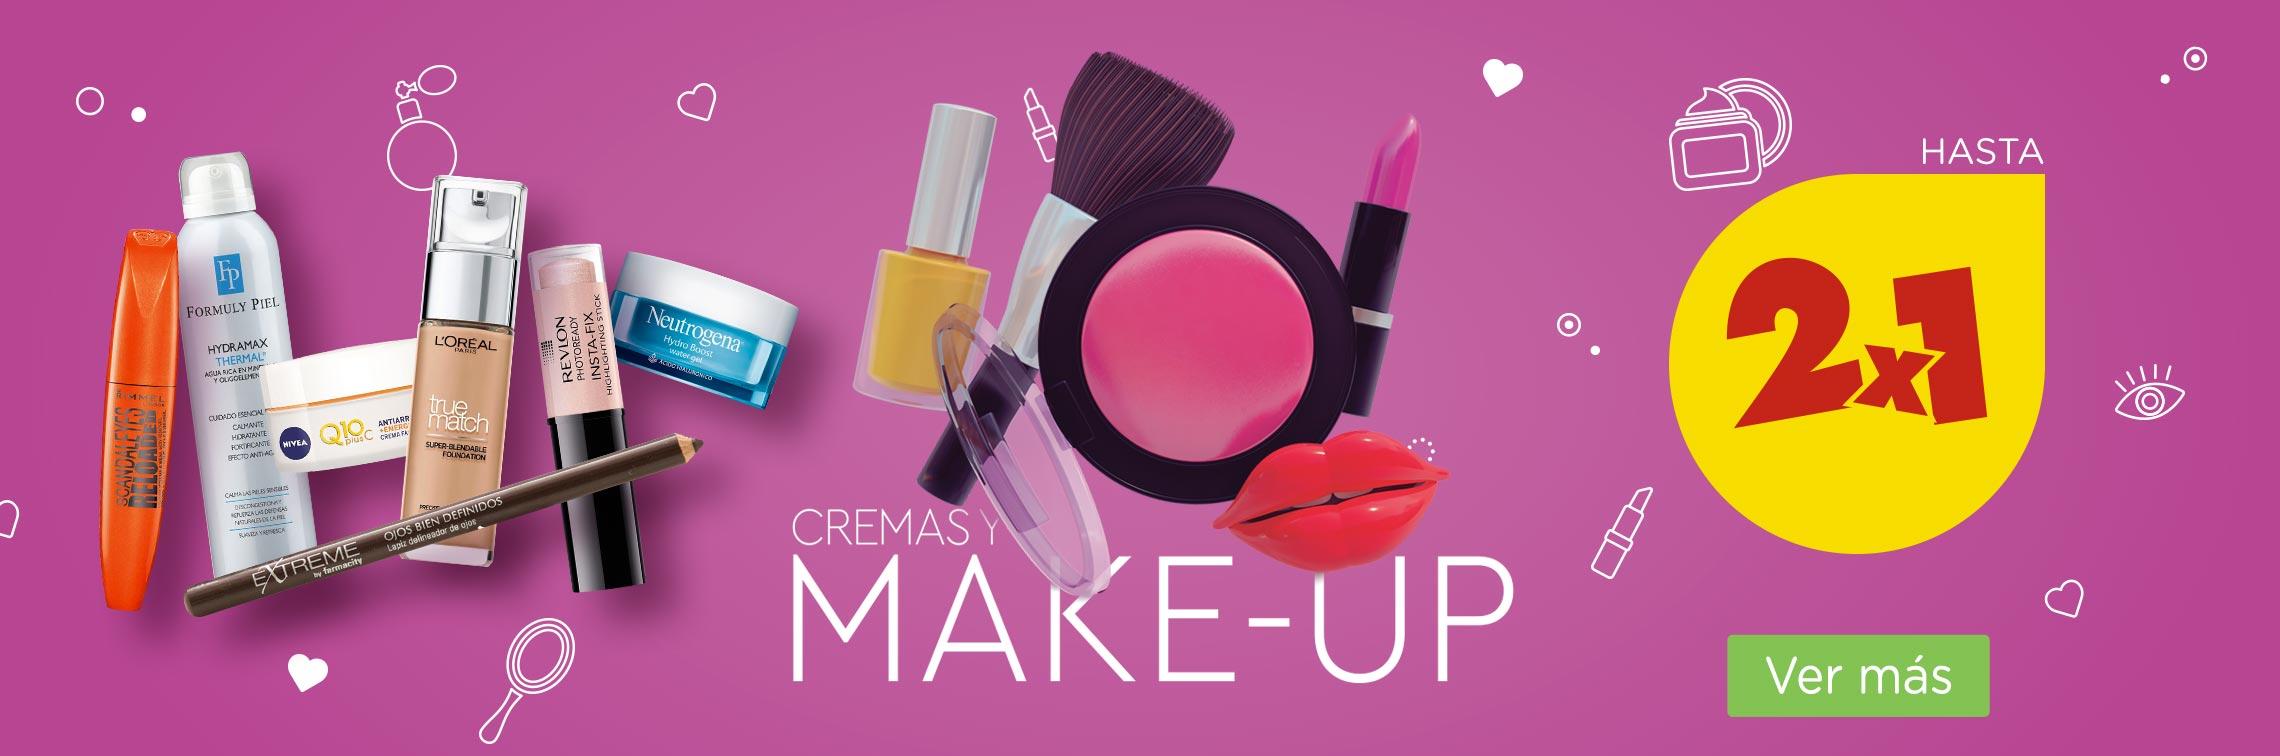 Make Up 2x1